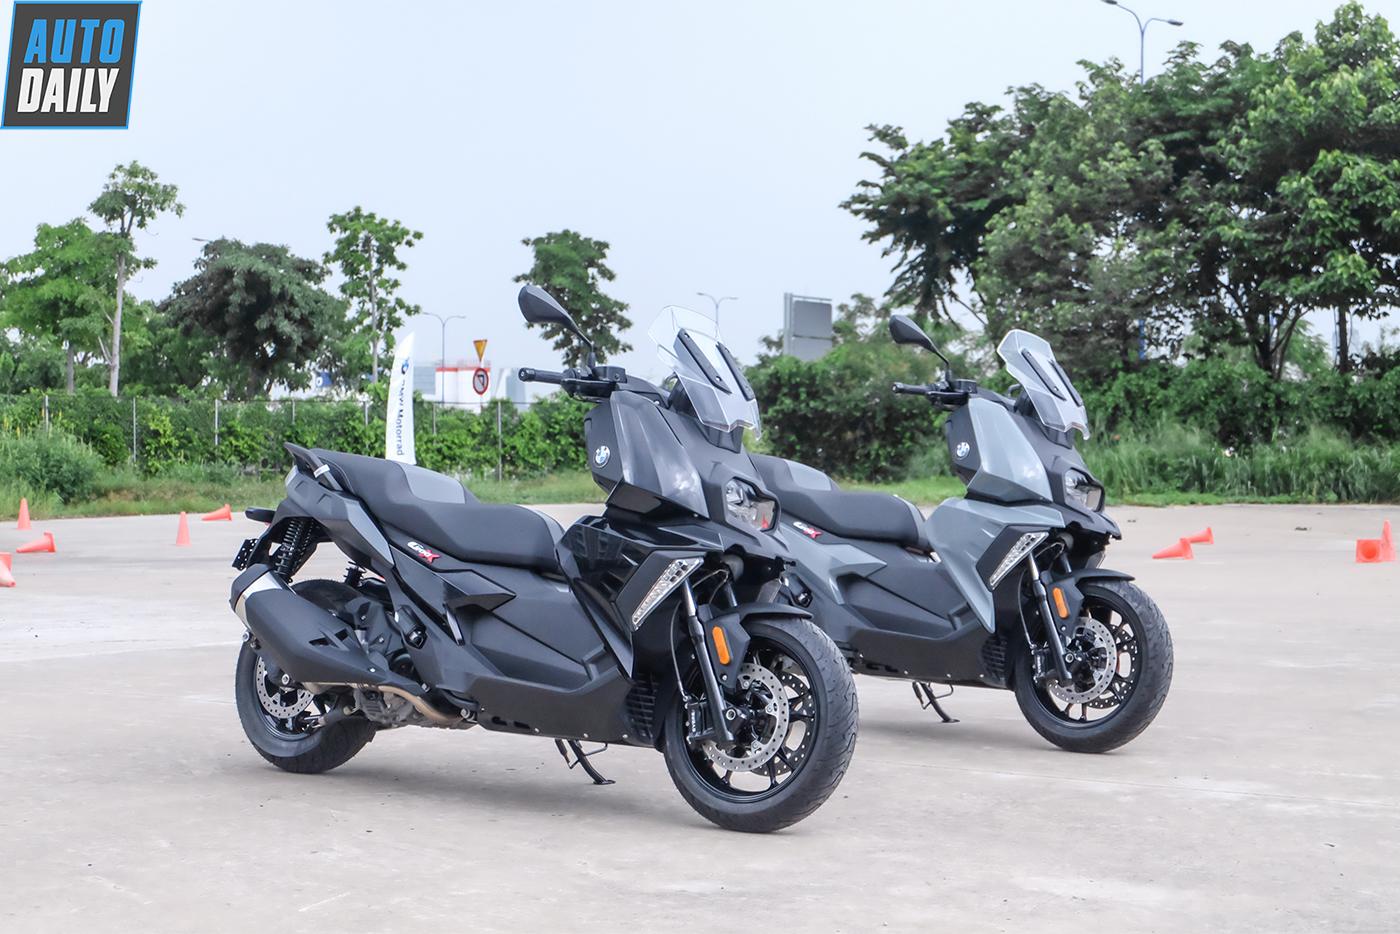 bmw-motorrad-c400x-6.jpg